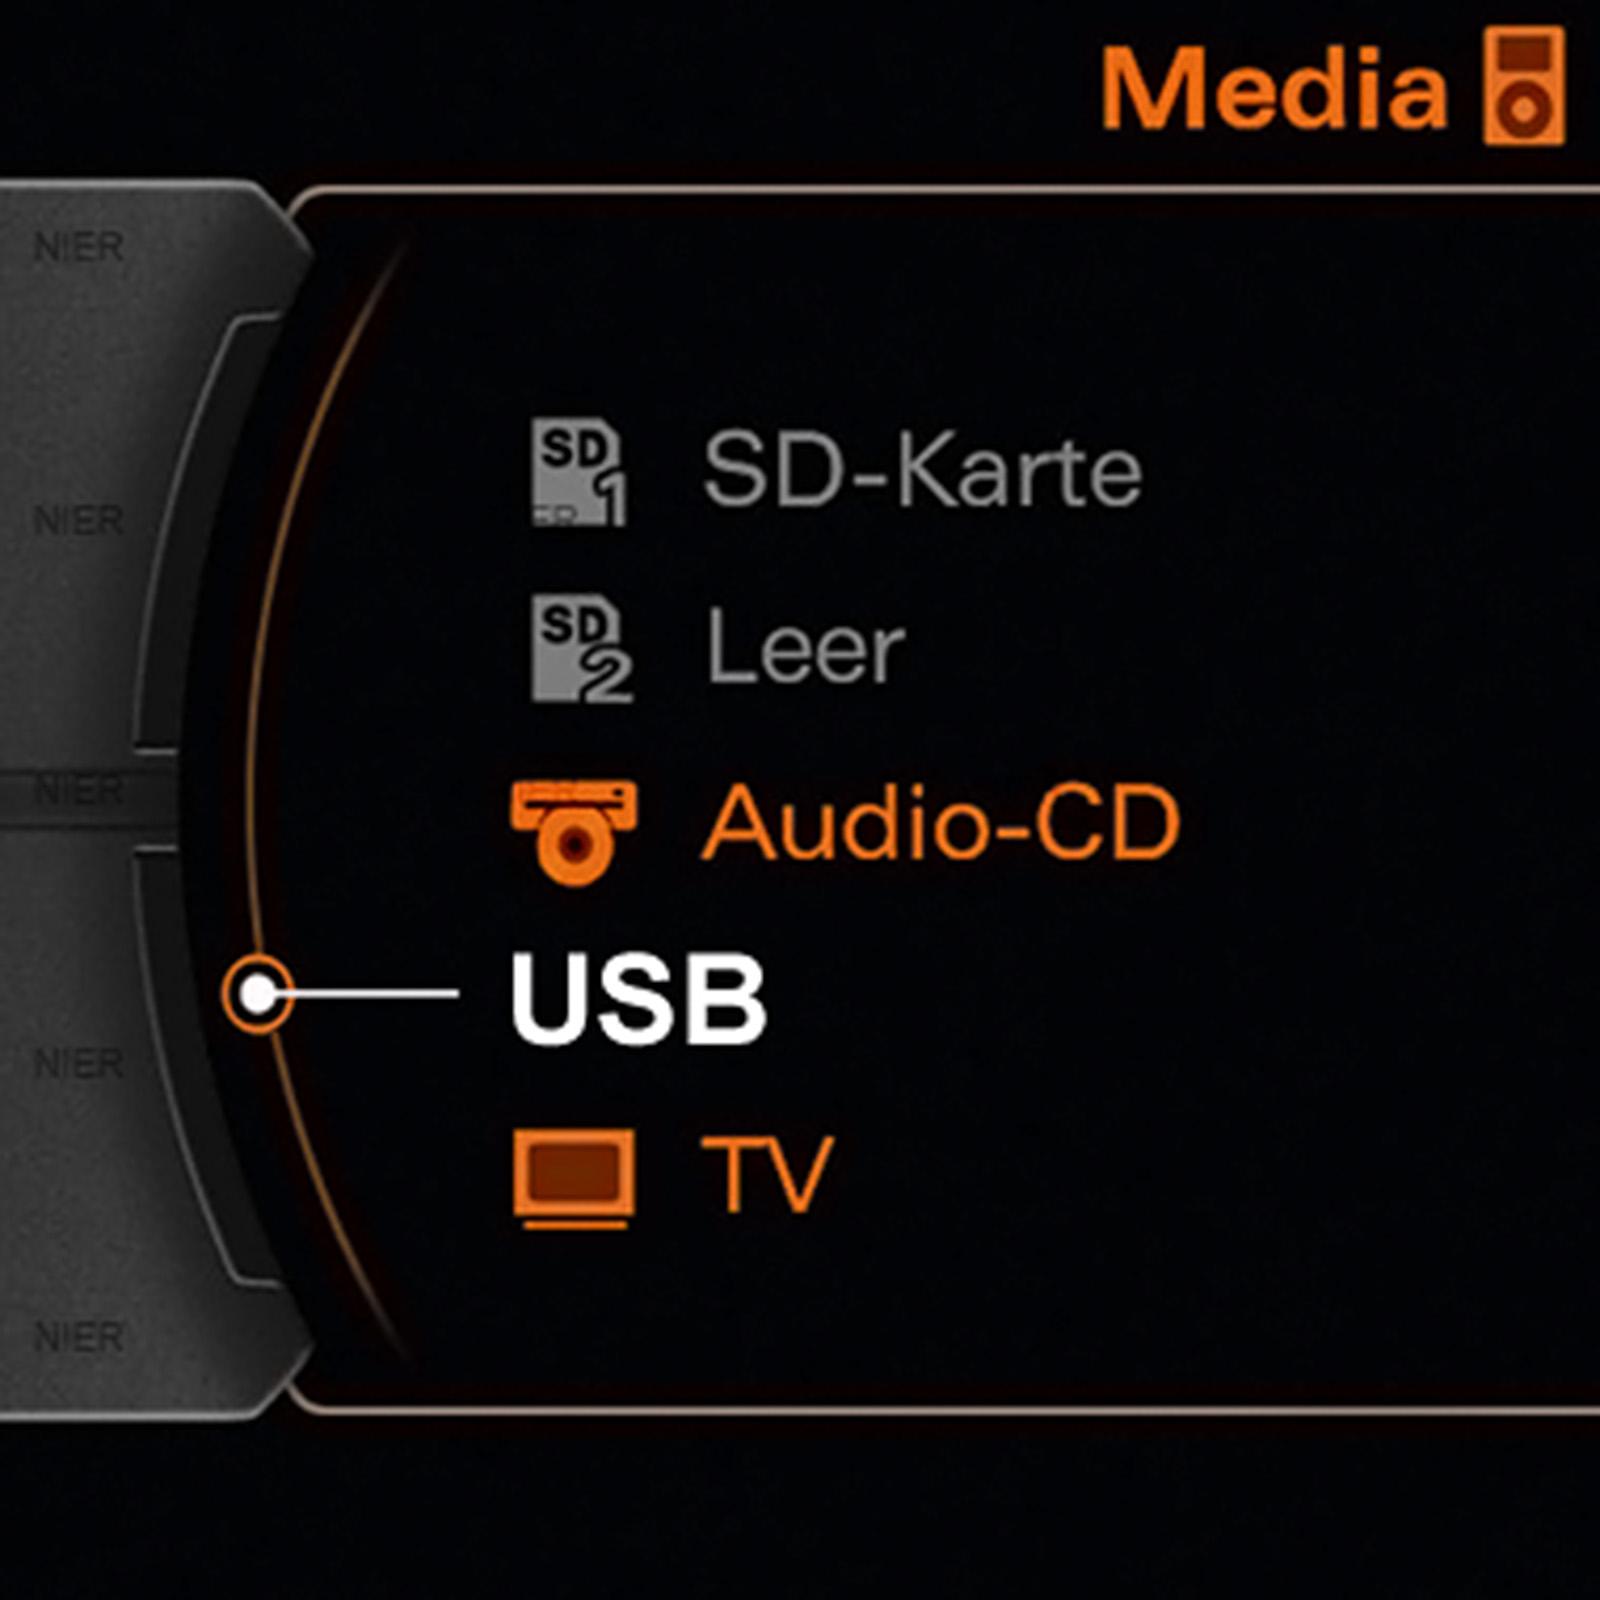 Media In Kabel Audi Volkswagen Skoda Seat Usb: AMI MMI USB Adapter Kabel Für VW Seat Skoda Audi A3 A4 S4